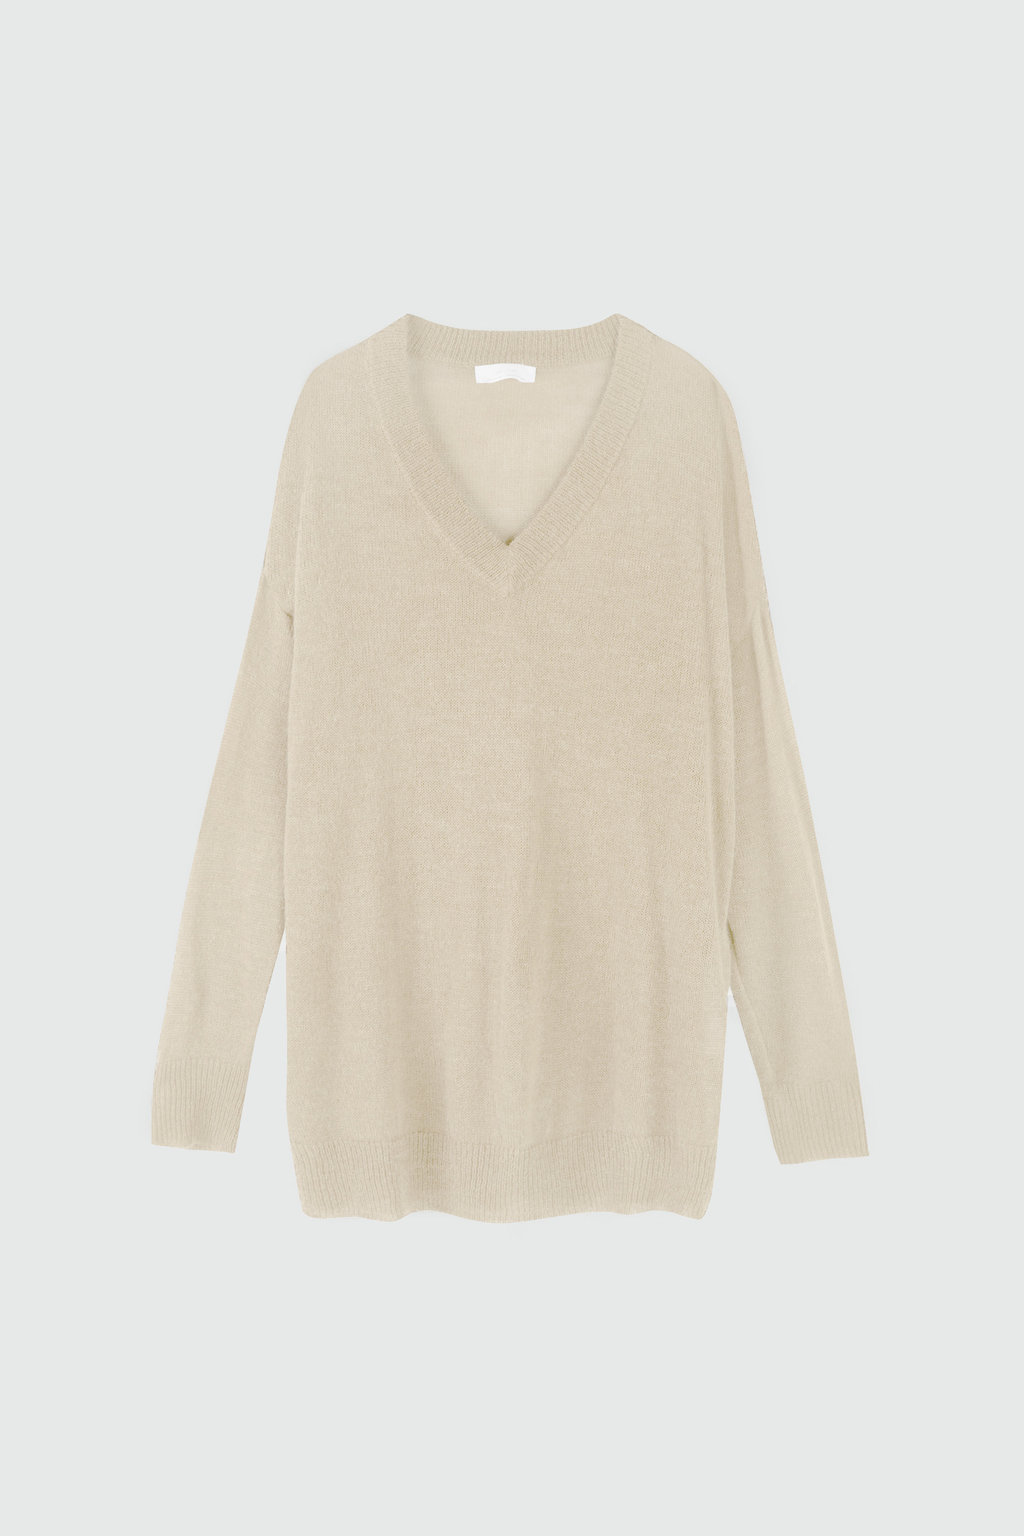 Sweater 2980 Cream 5